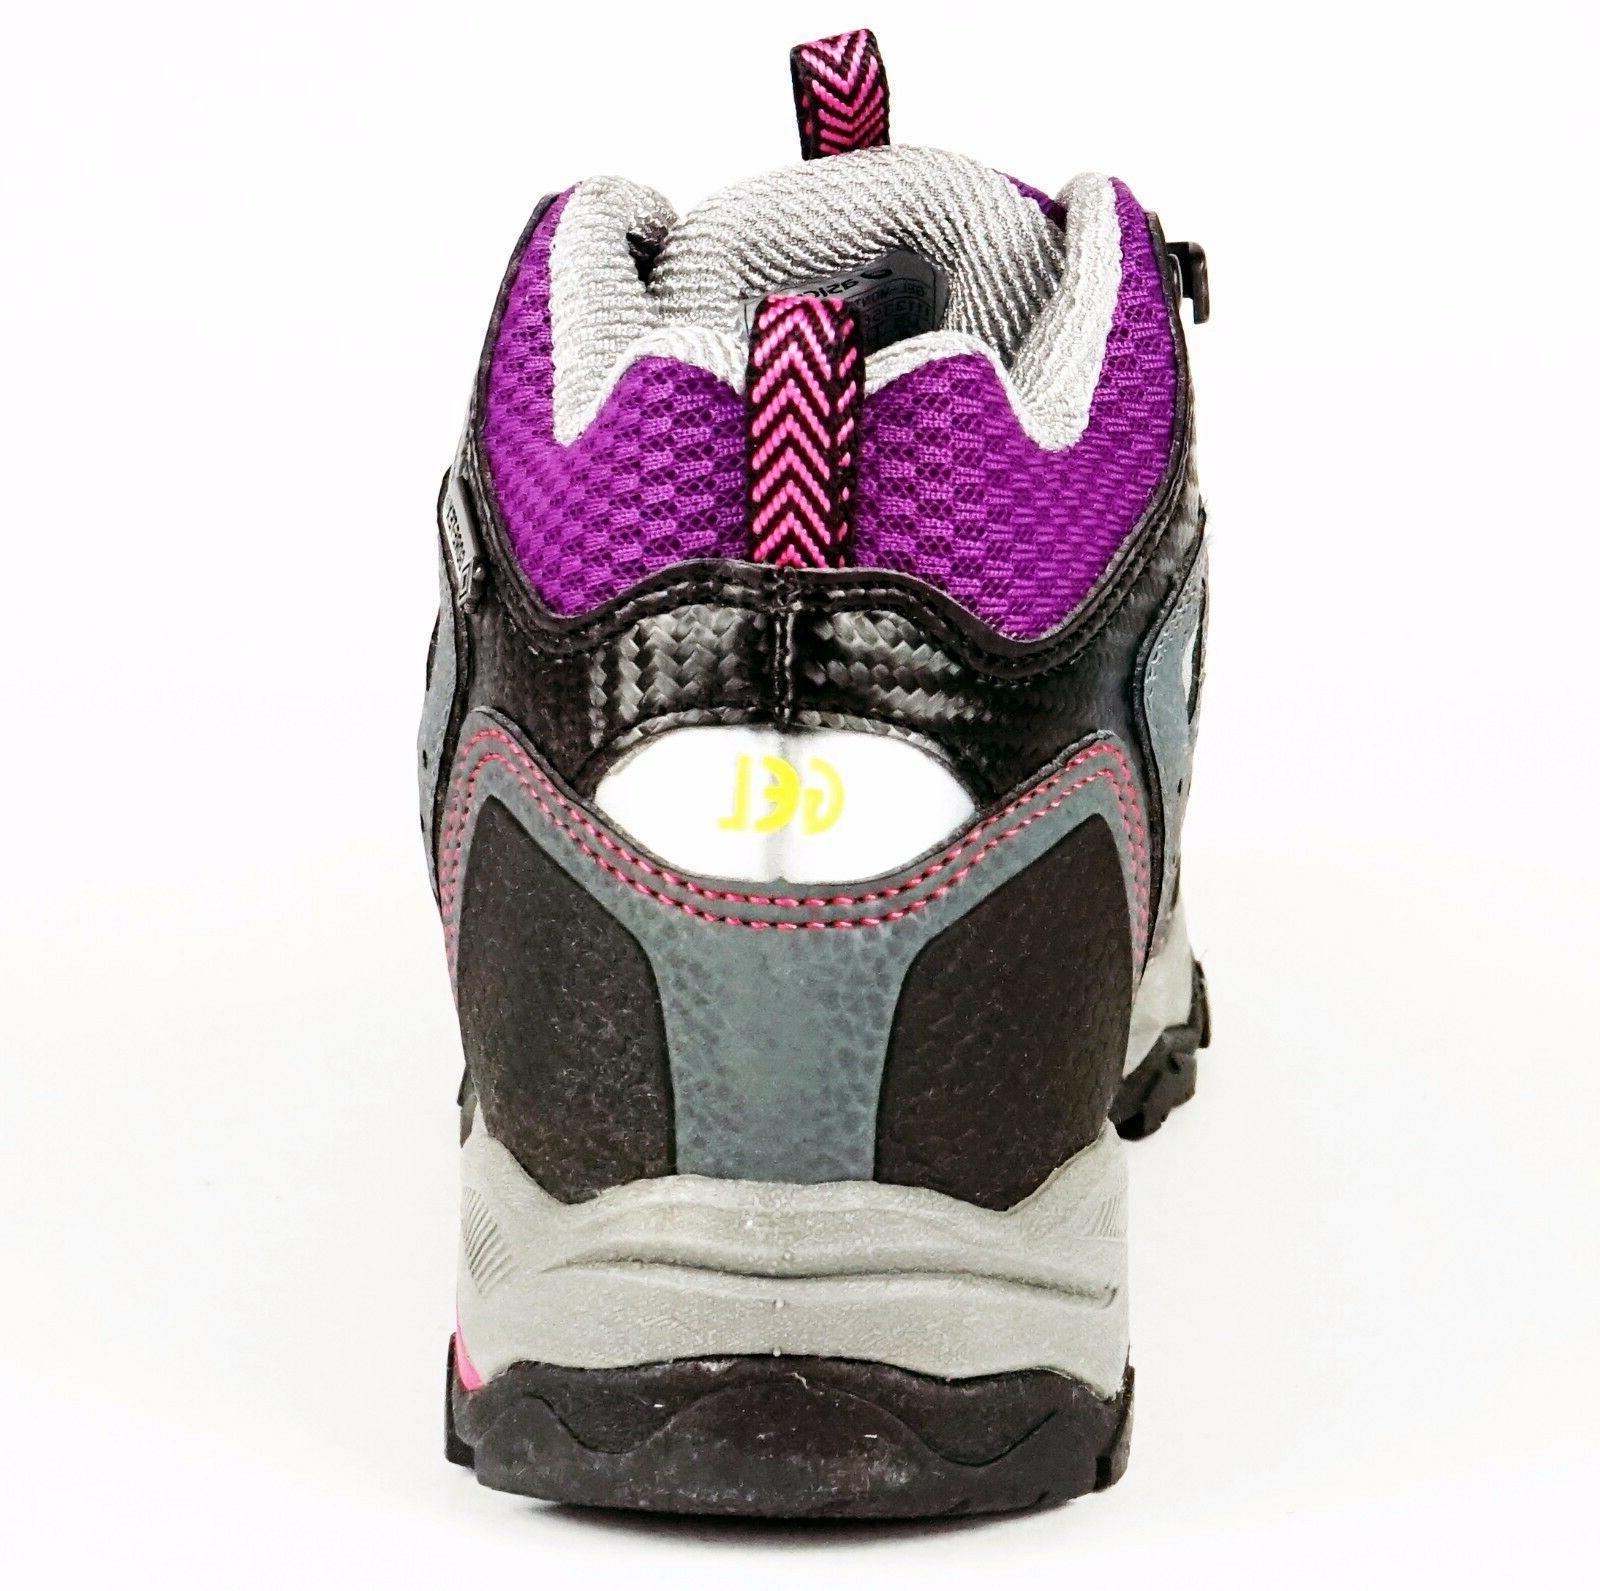 Asics Womens GEL-MONTALTO Mid Trekking Hiking Boots